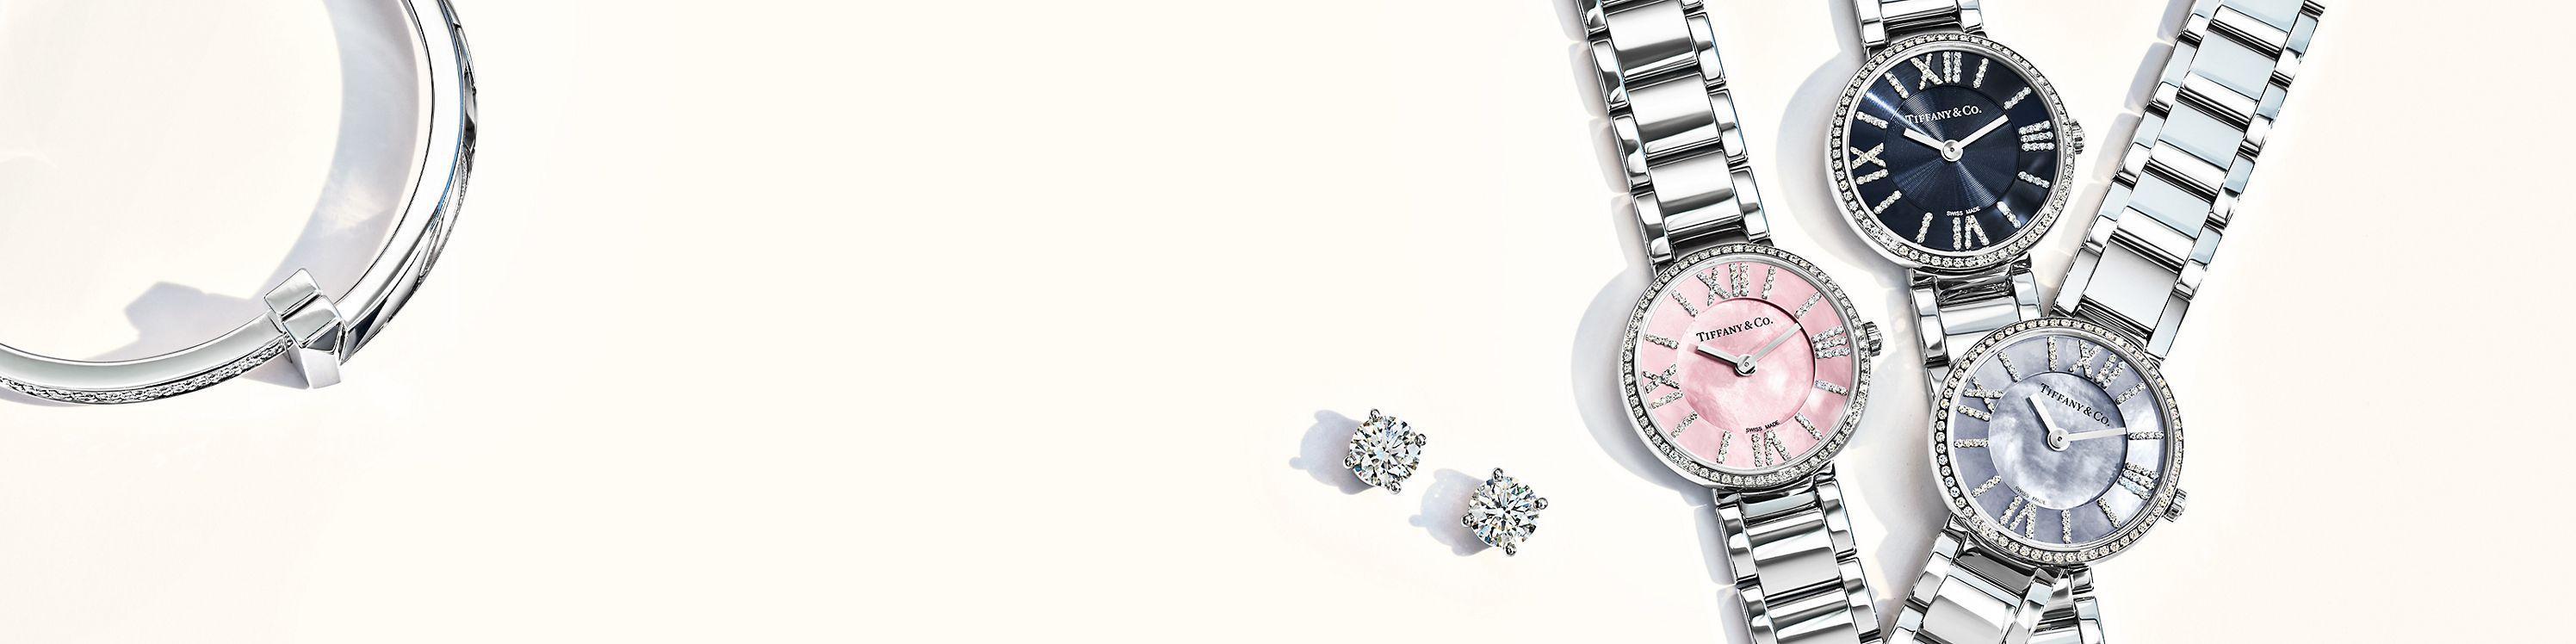 Shop Tiffany & Co. Atlas® Watches